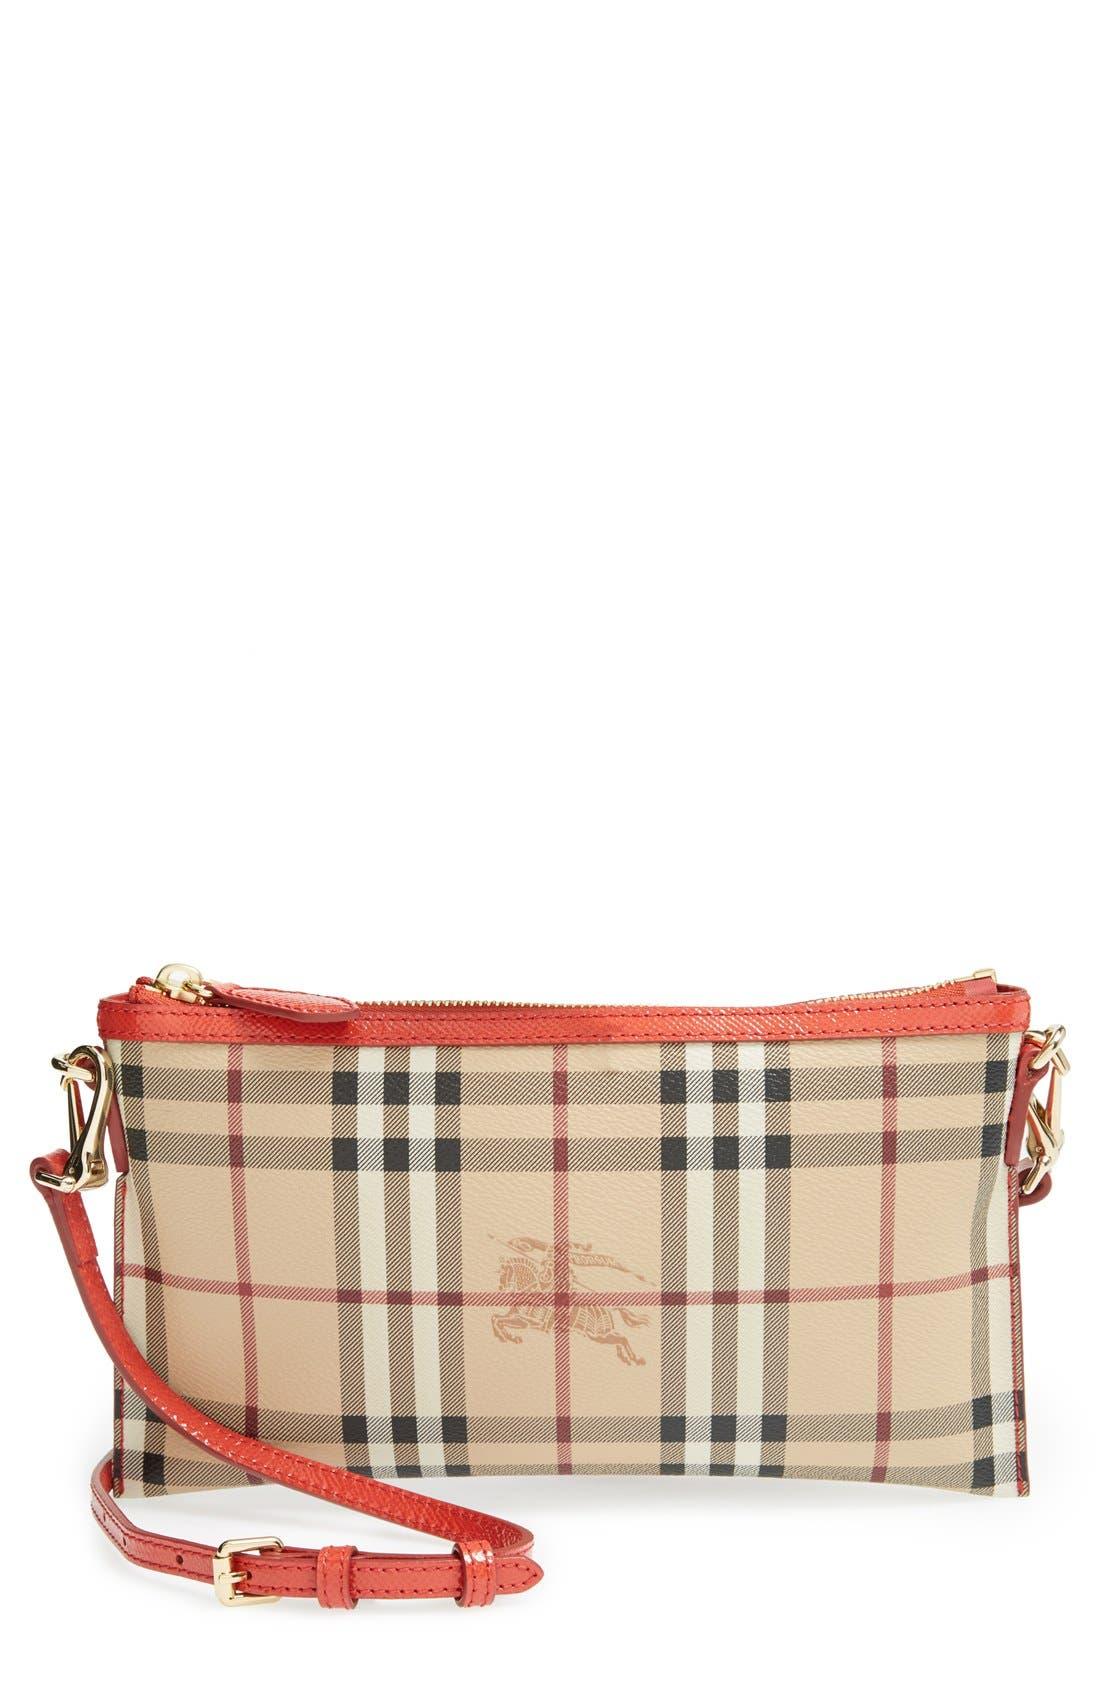 Alternate Image 1 Selected - Burberry 'Peyton - Haymarket Check' Crossbody Bag